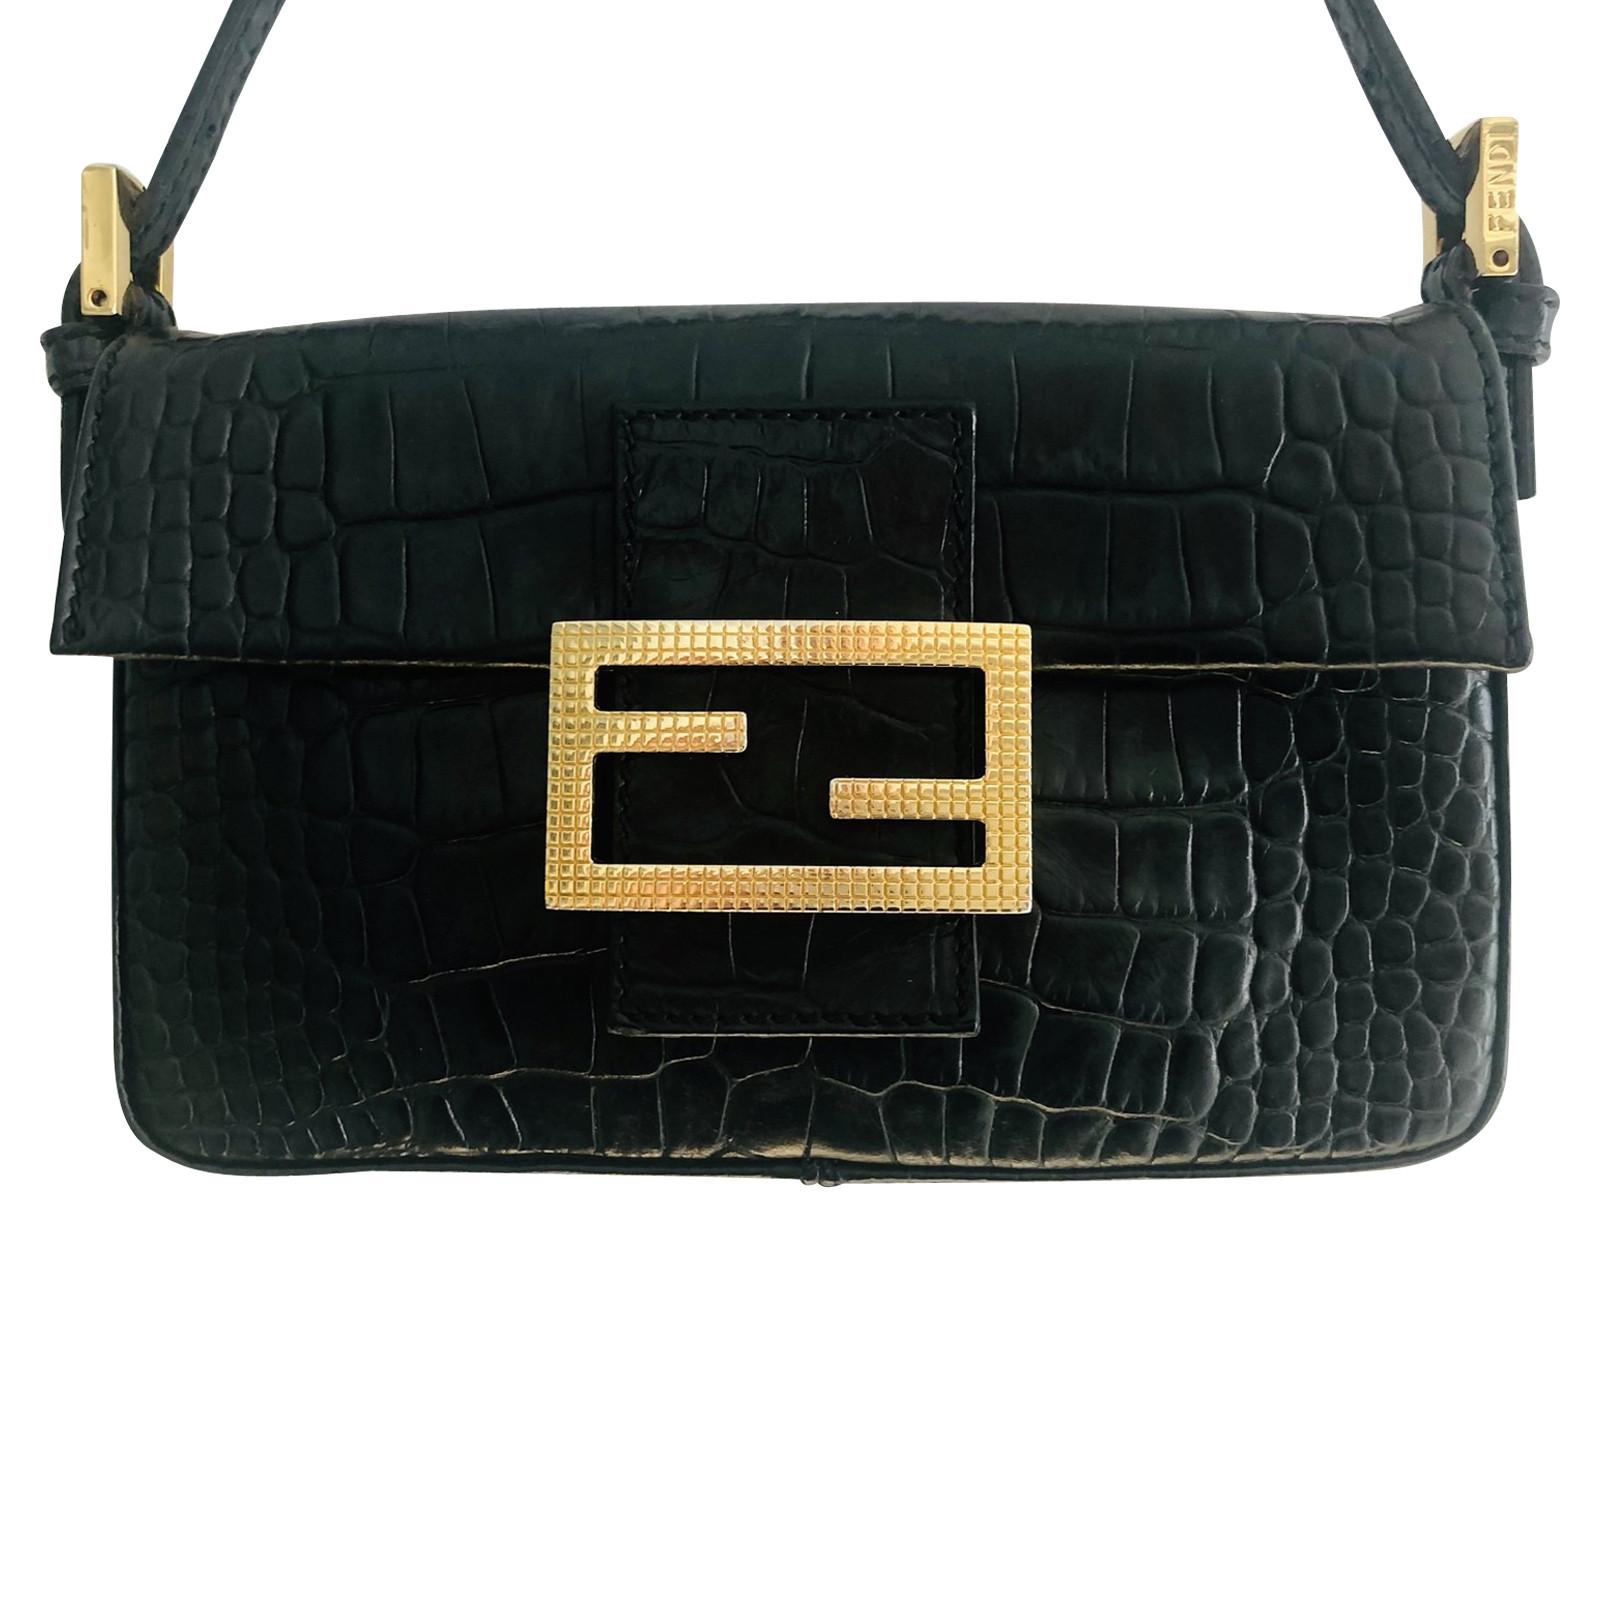 Fendi Baguette Bag Leather in Black Second Hand Fendi